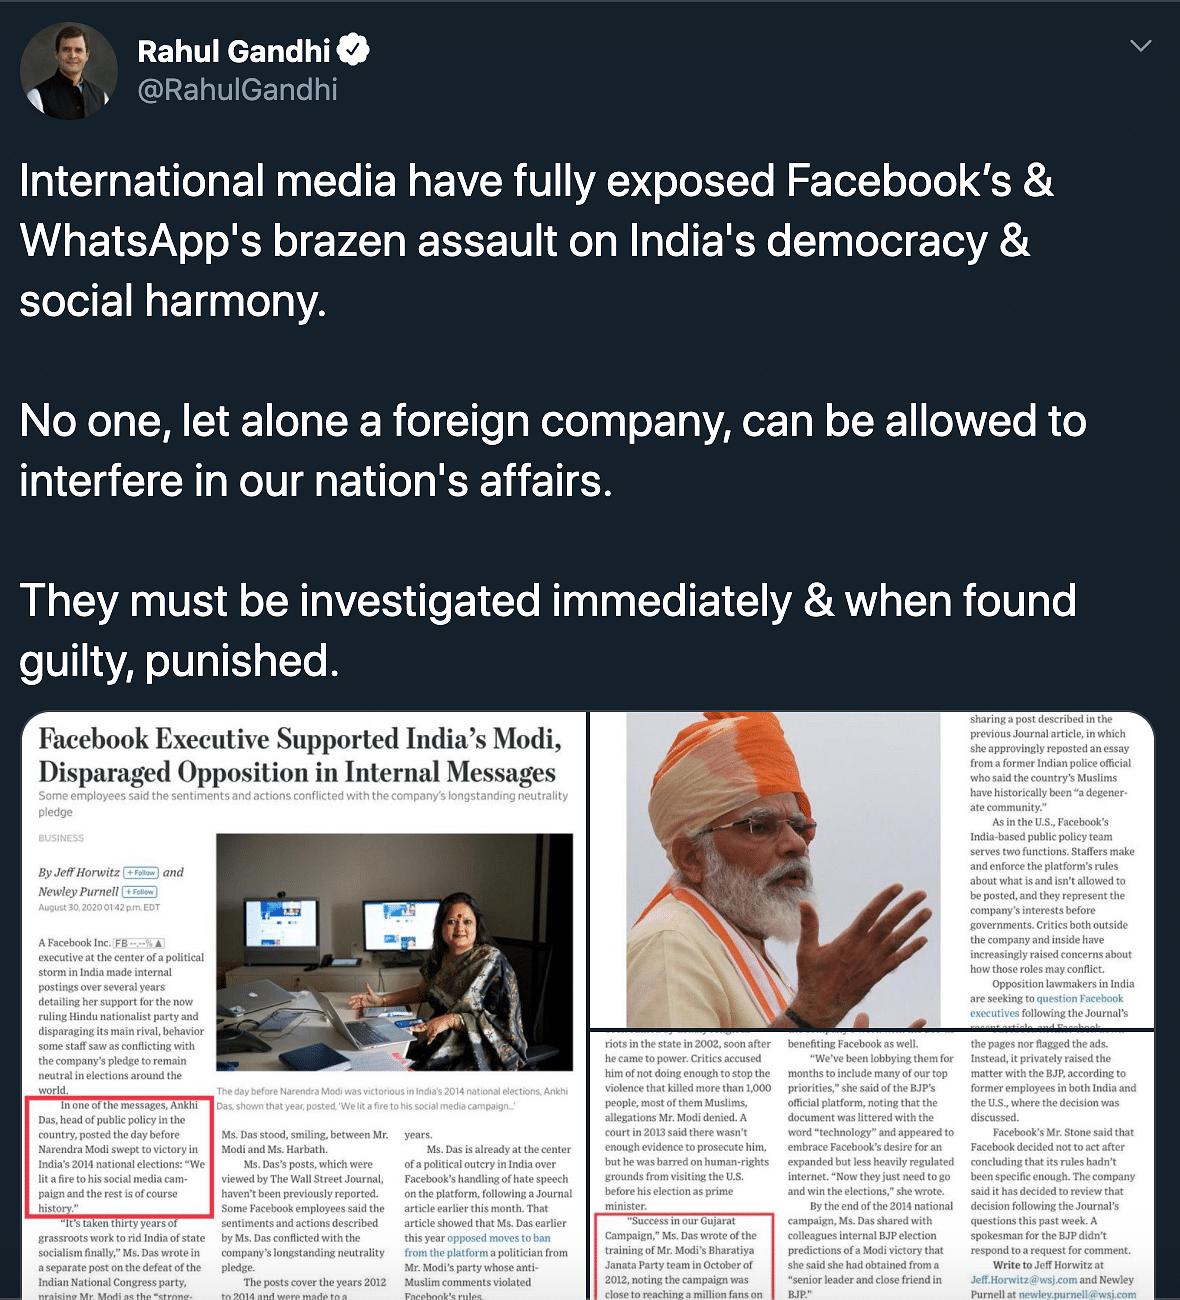 'Assault on Democracy Exposed': Rahul Gandhi on Facebook-BJP Row